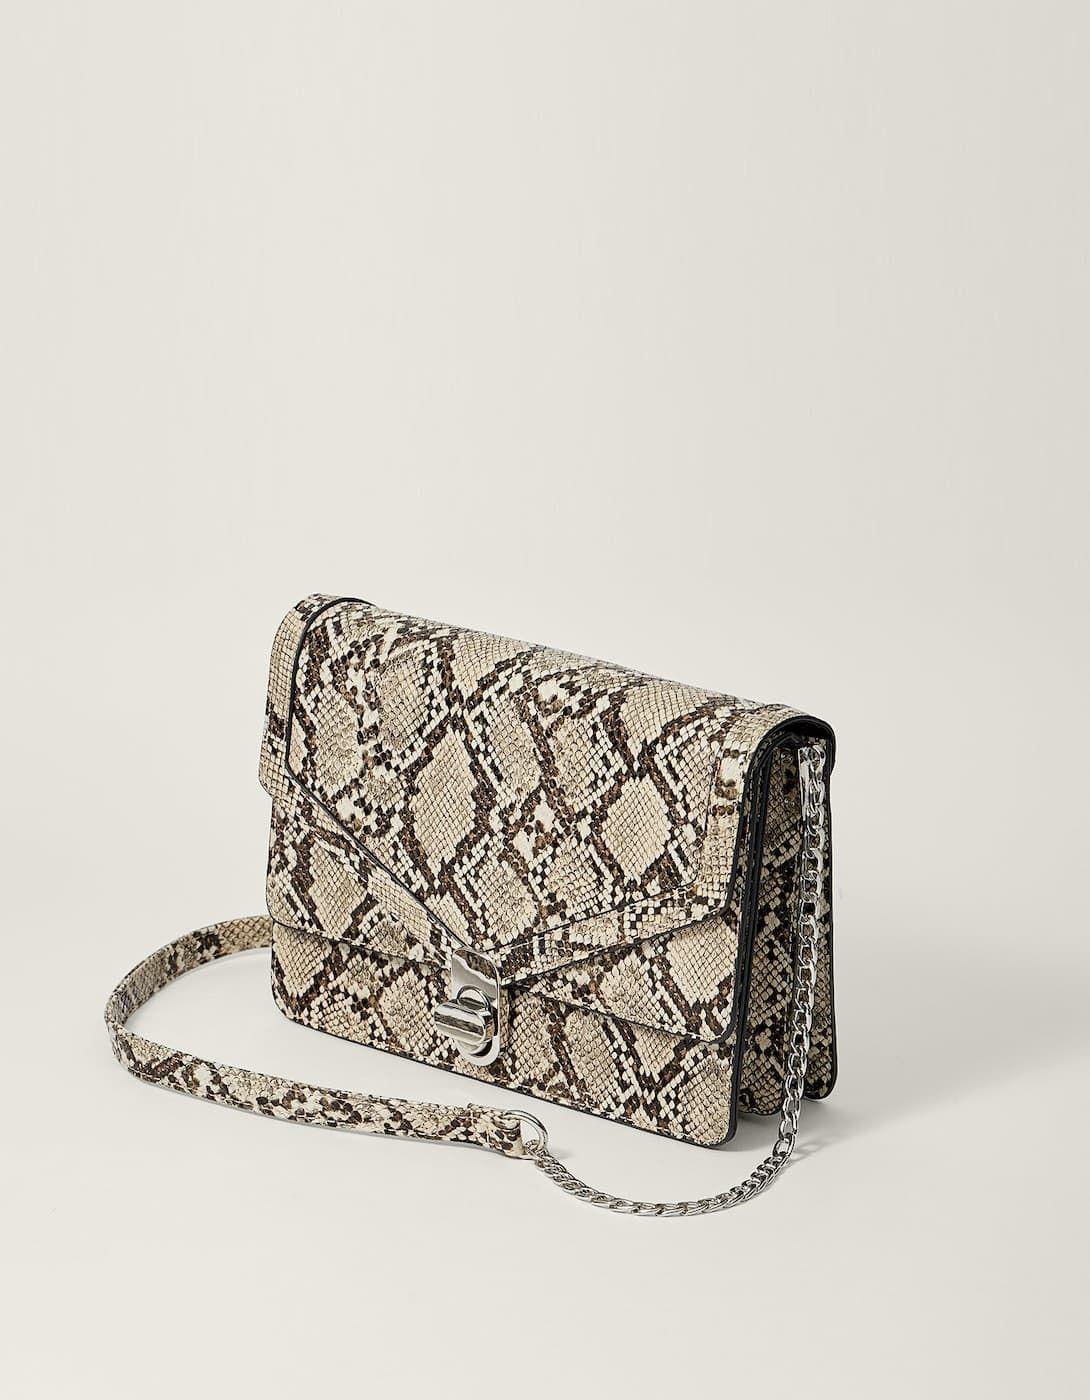 706318d9b05 Faux snakeskin crossbody bag - Just in   Stradivarius United Kingdom ...